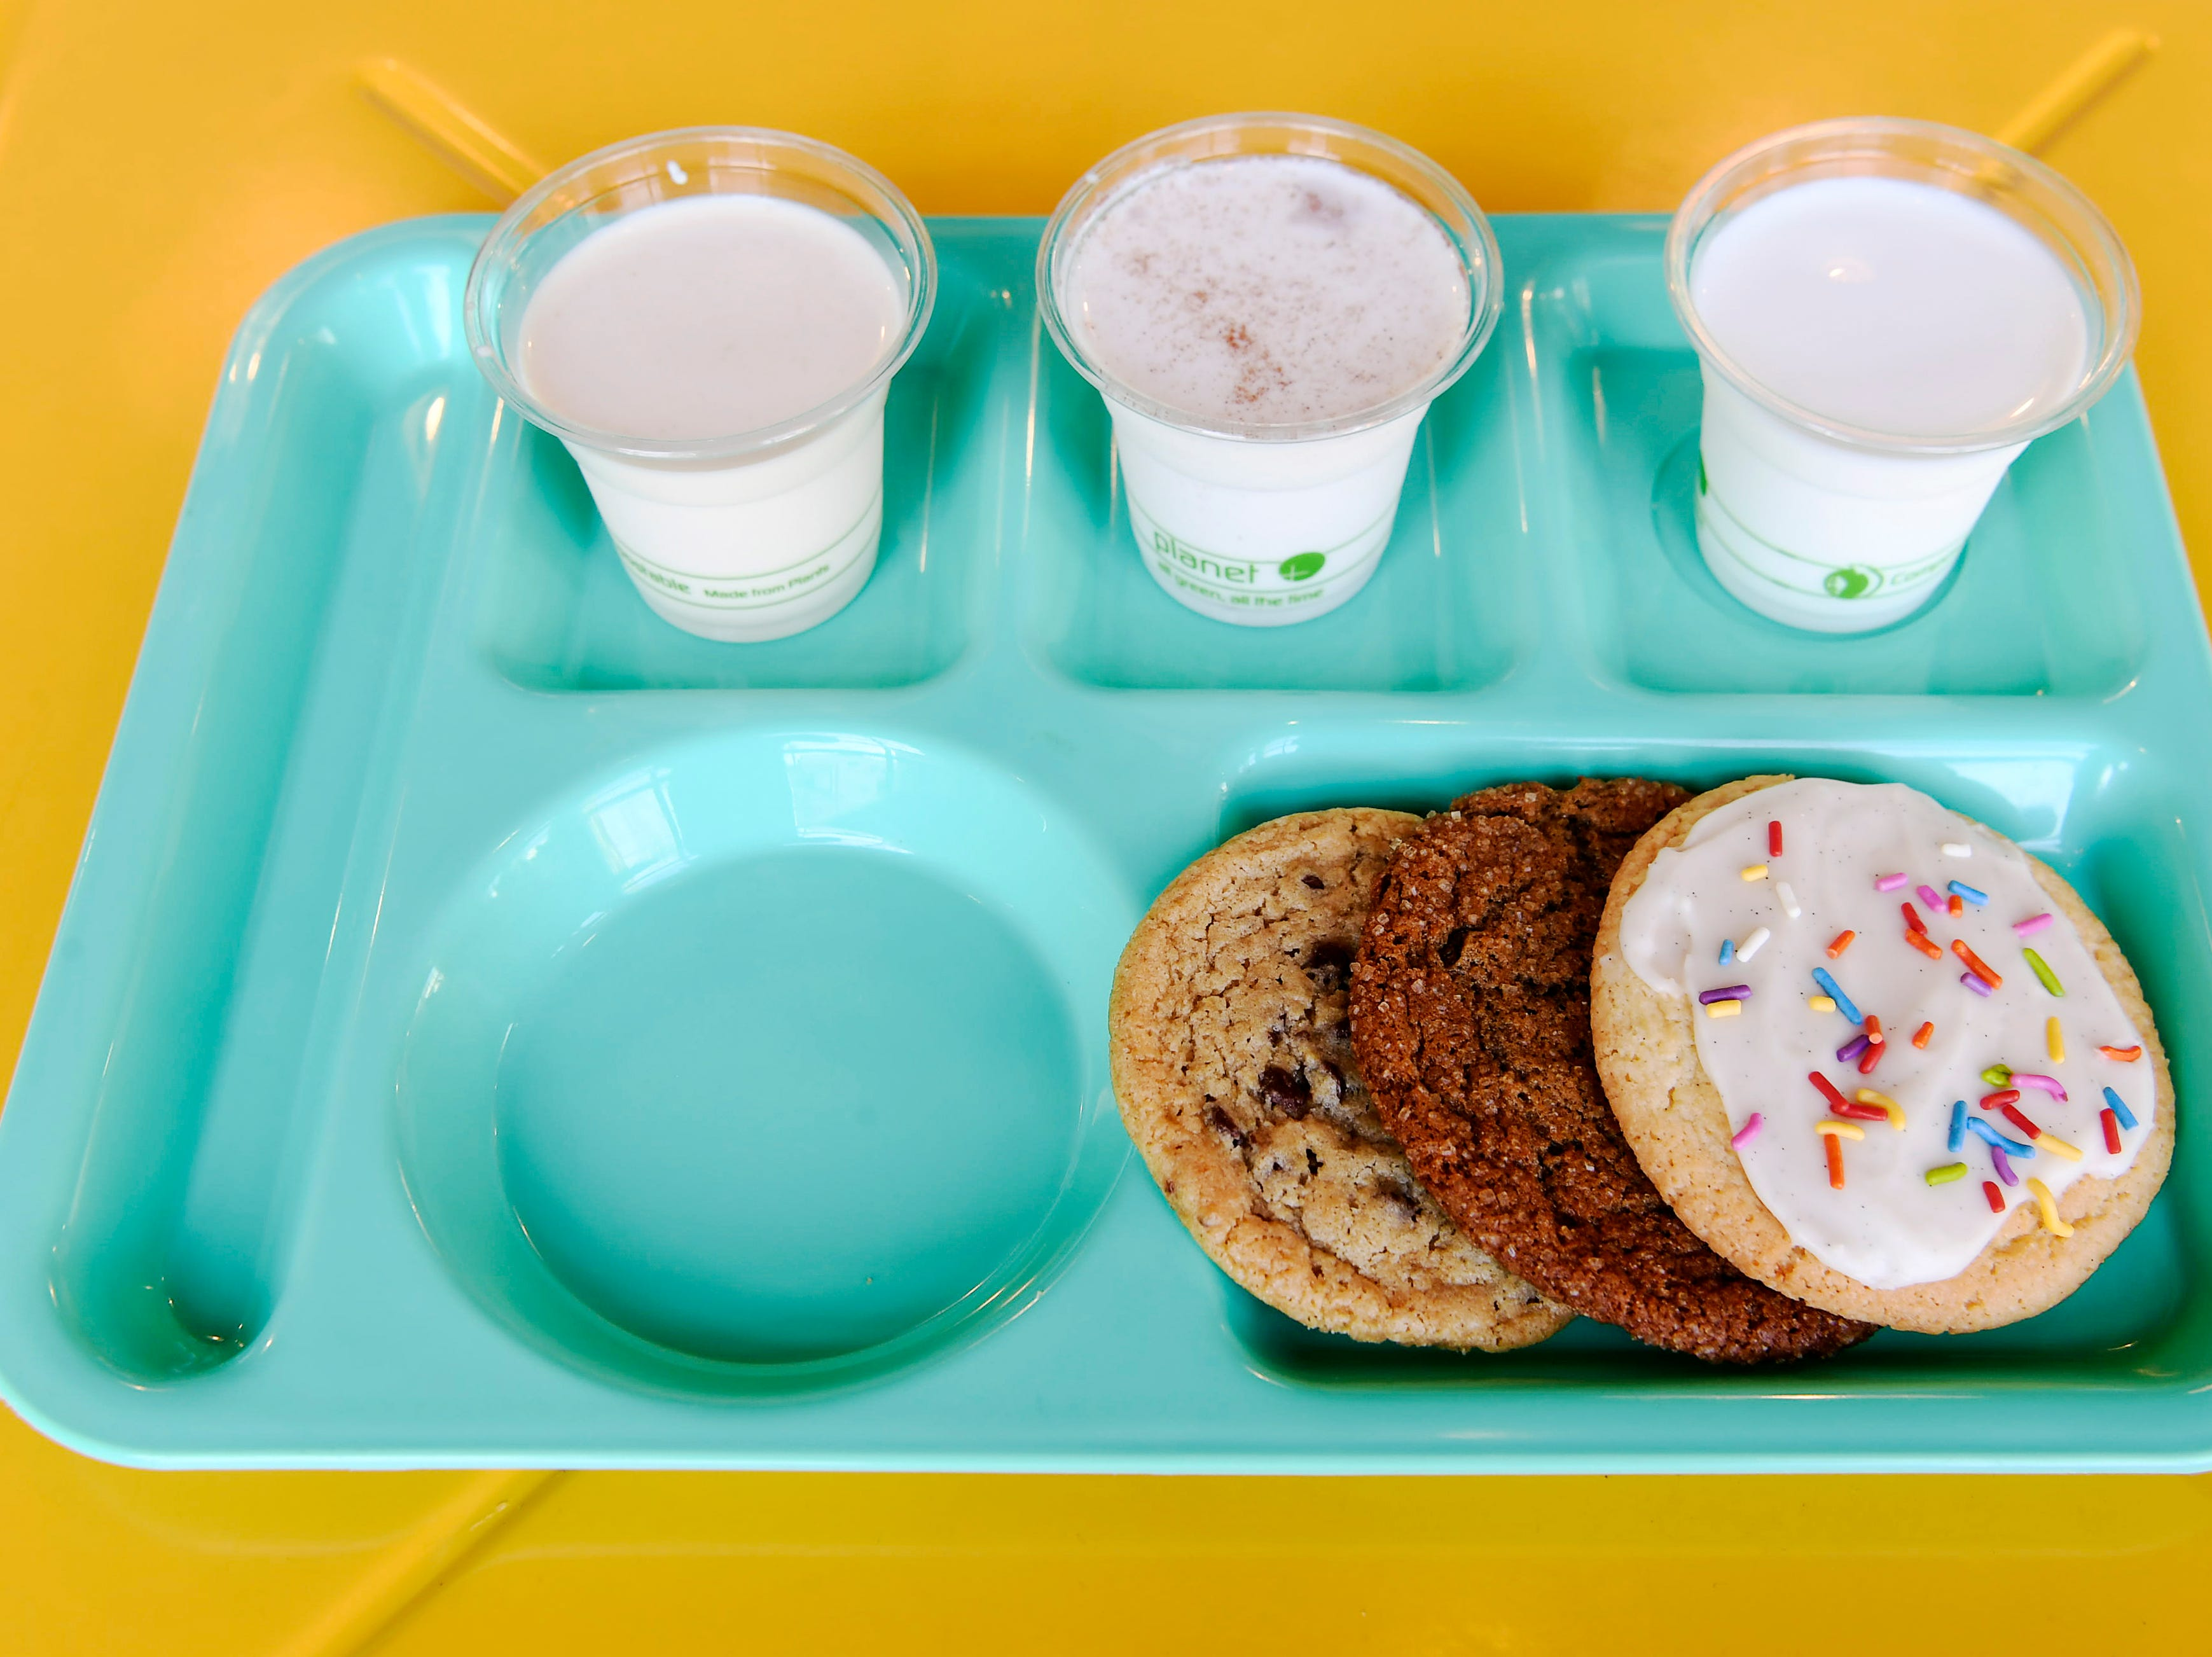 Sunshine Sammies offers flights of milk and cookies.